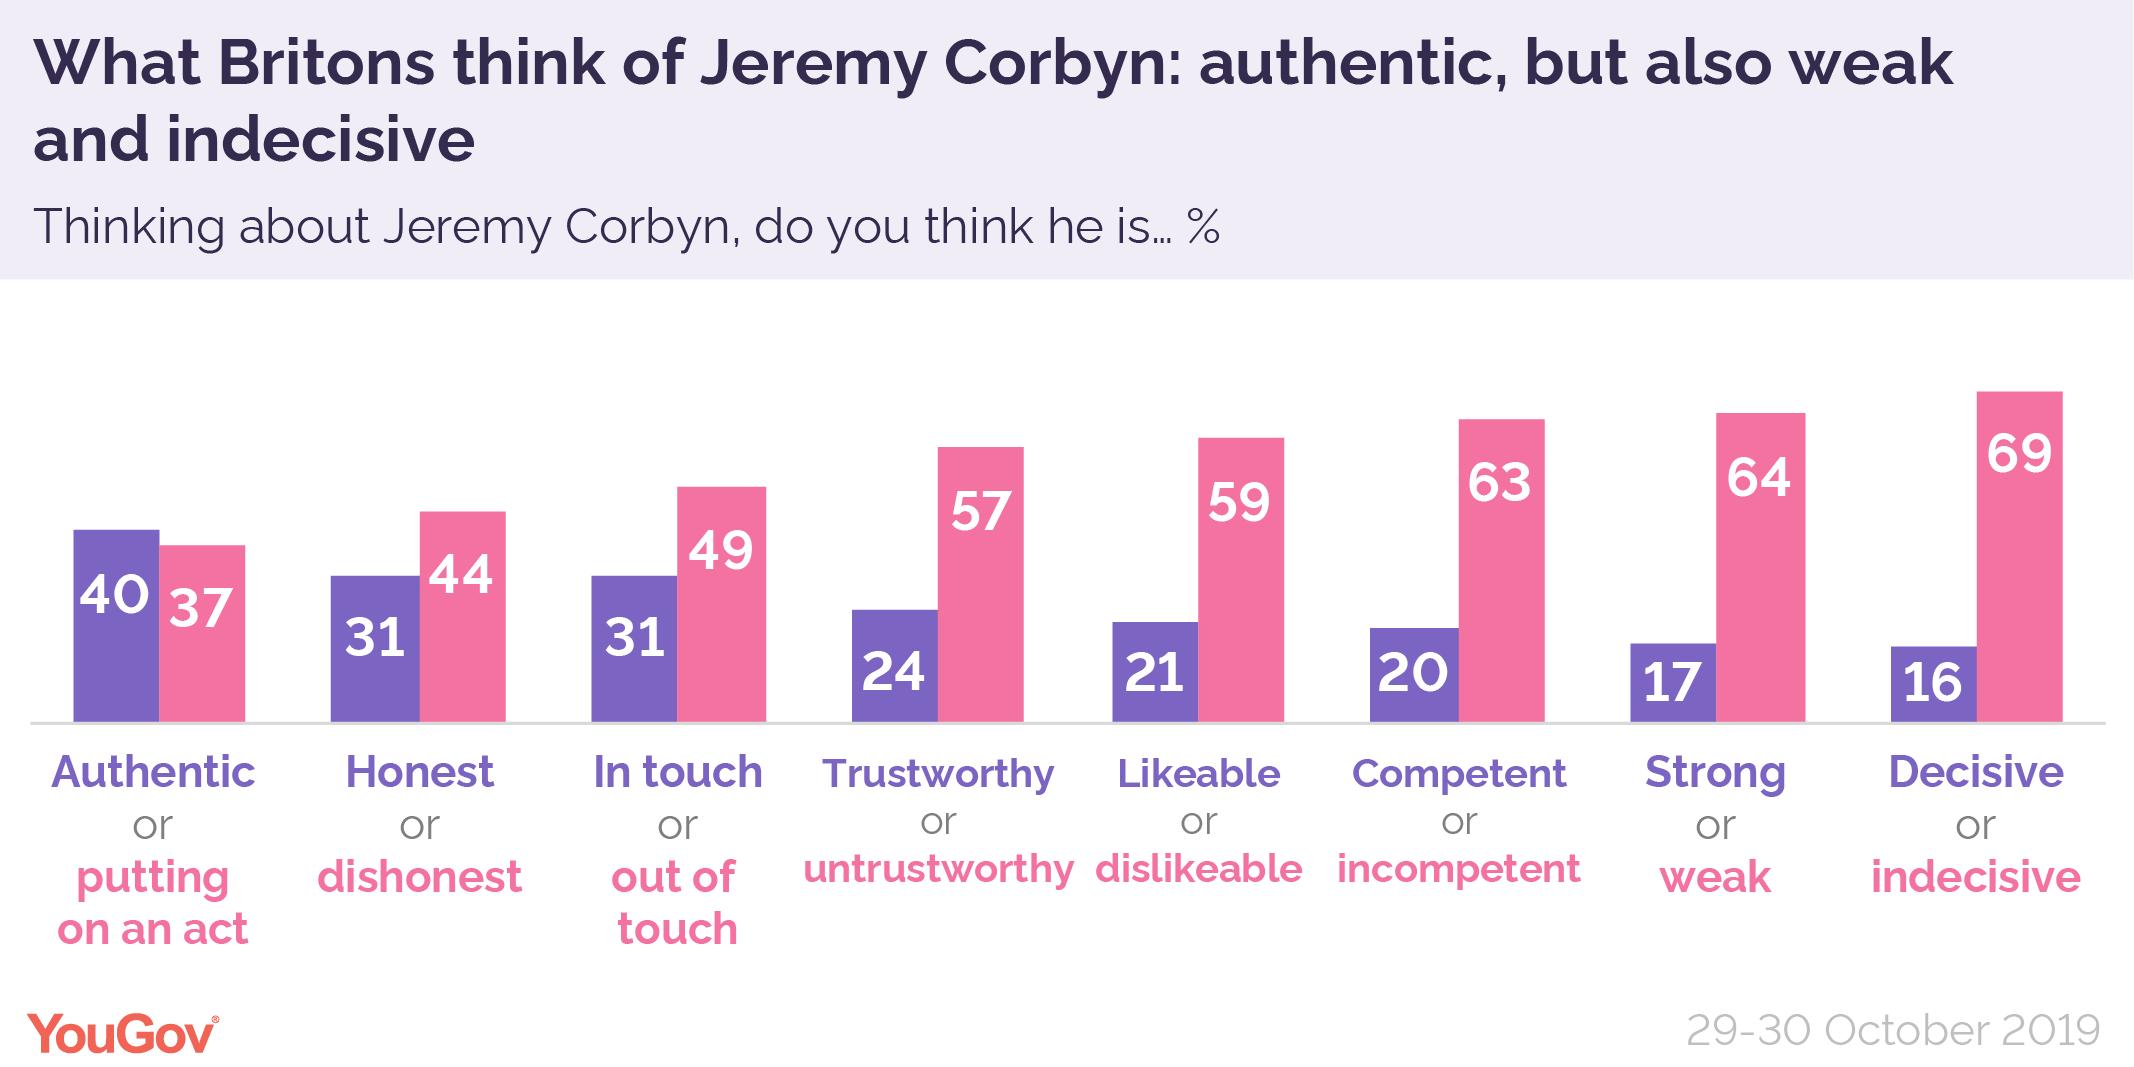 Jeremy%20Corbyn%20attributes%20Oct%202019-01.png